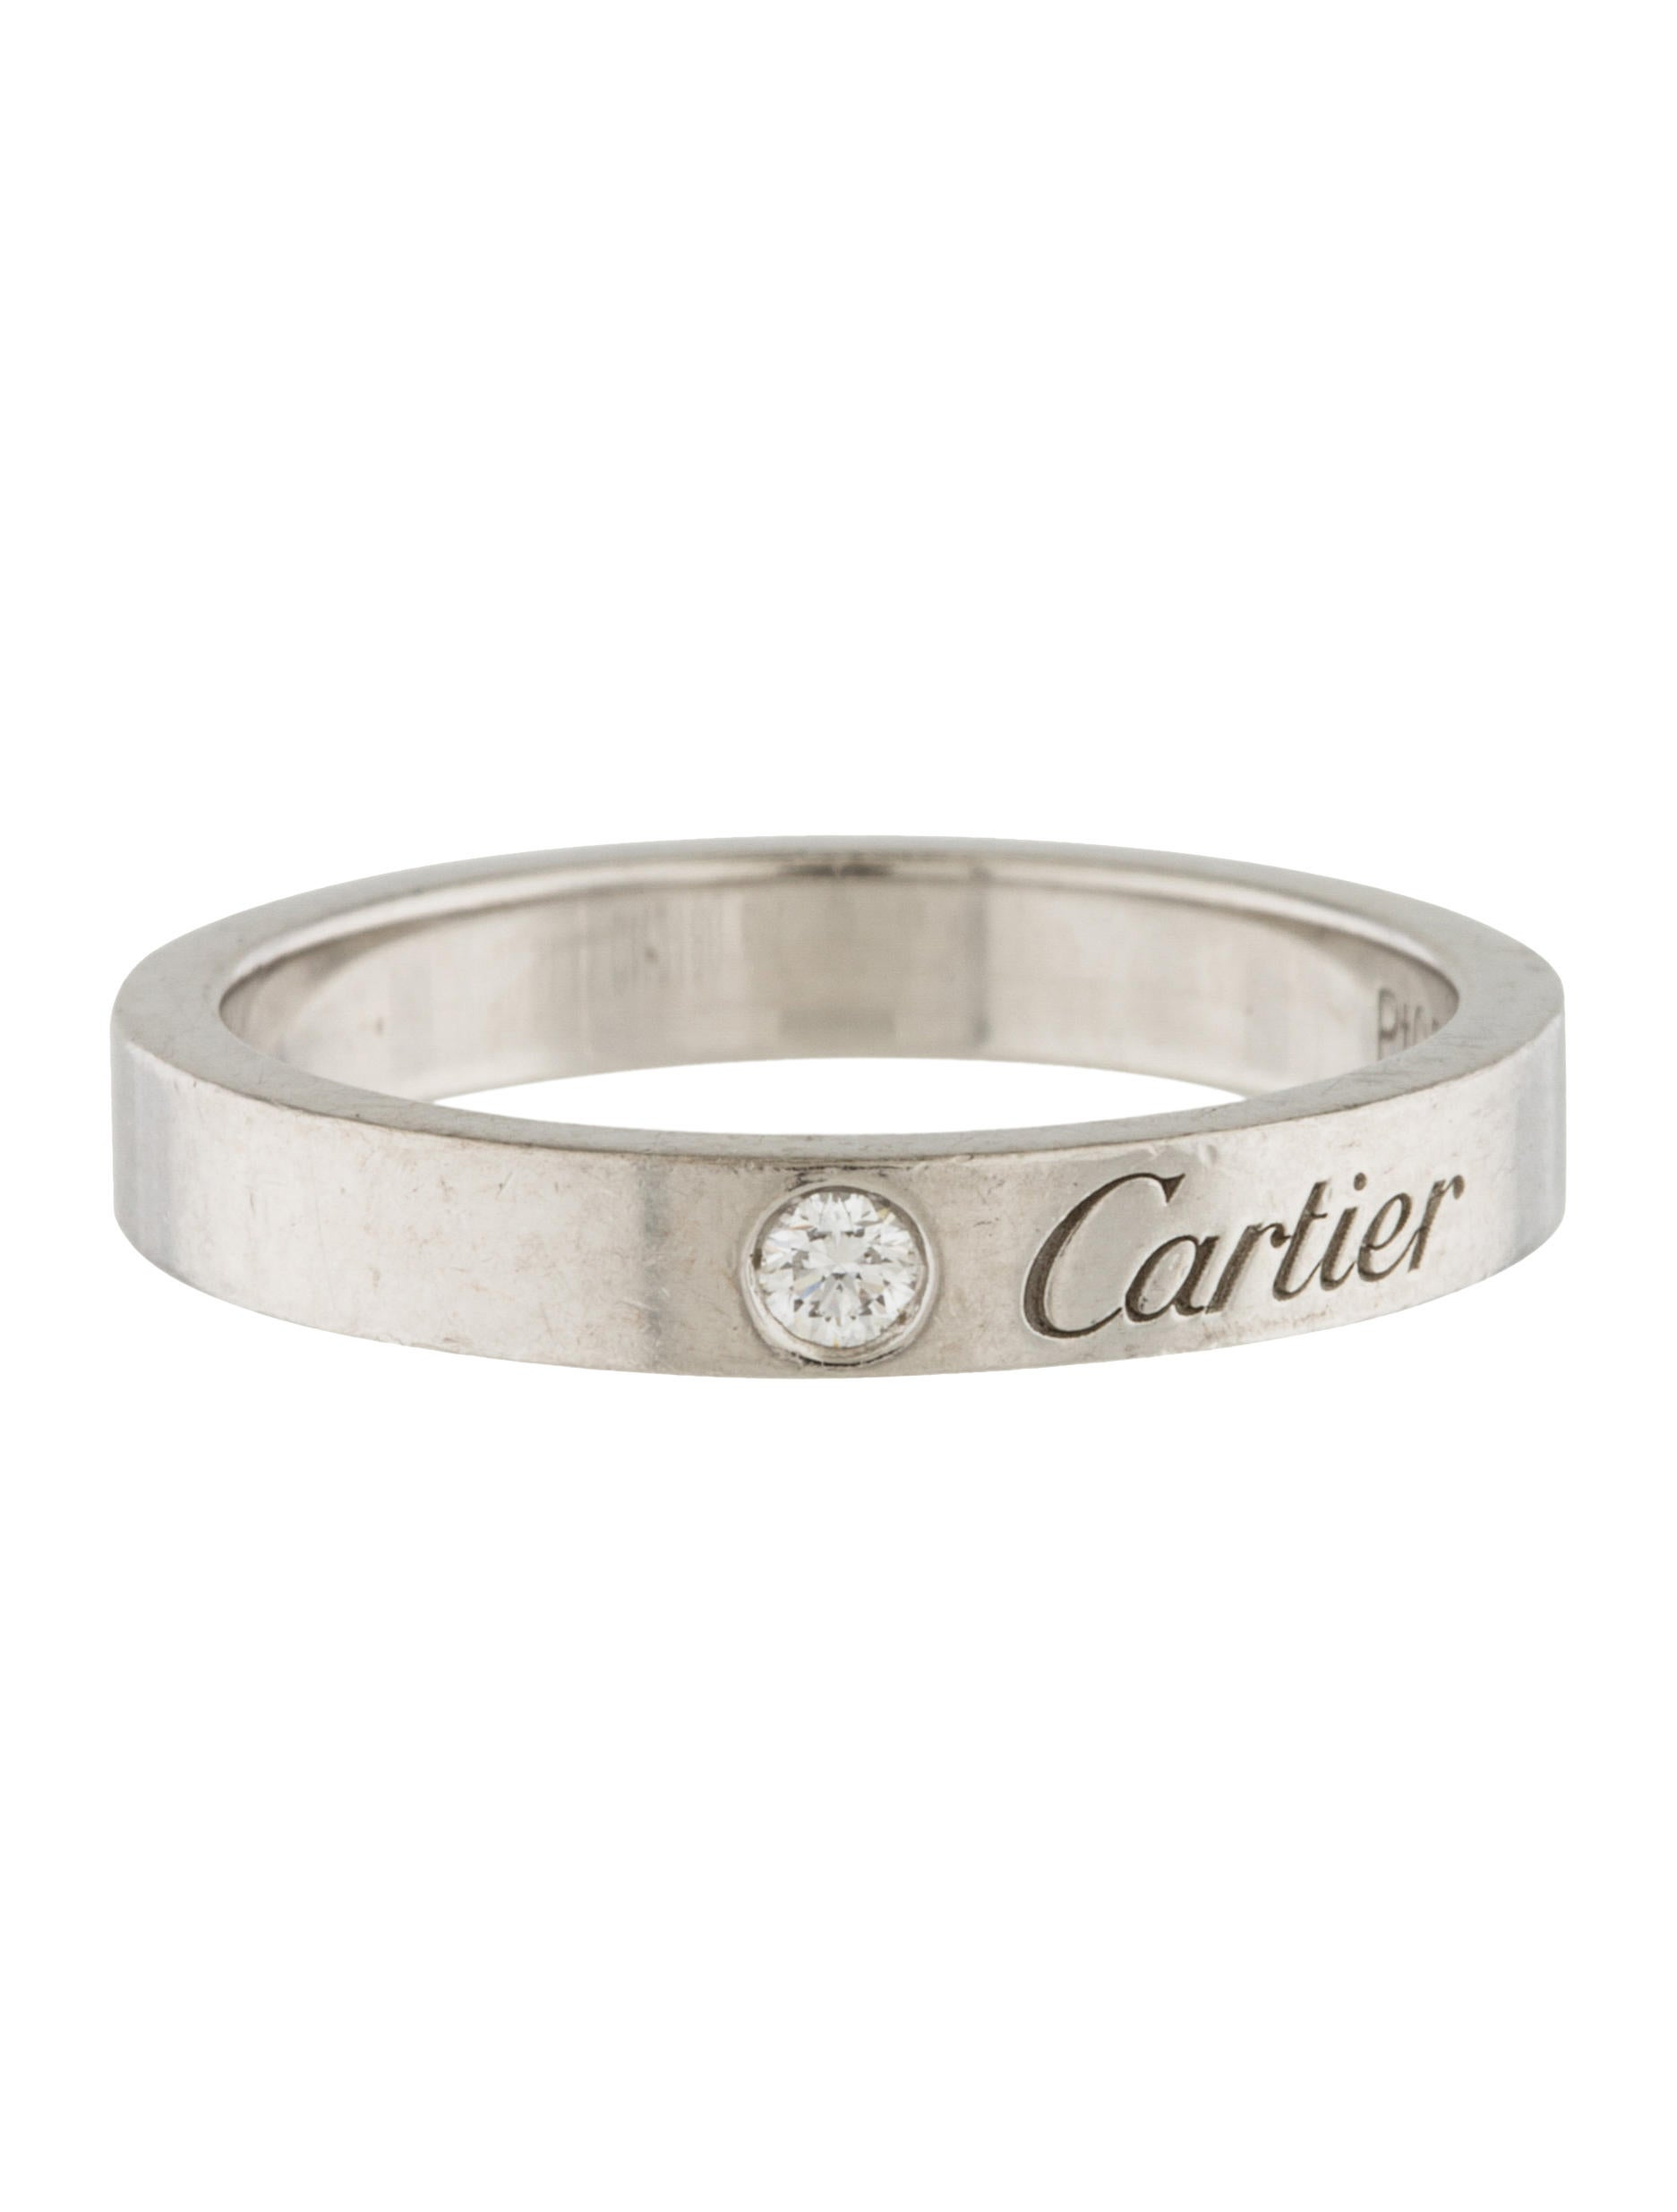 Cartier c de cartier wedding band rings crt32355 the realreal c de cartier wedding band junglespirit Image collections